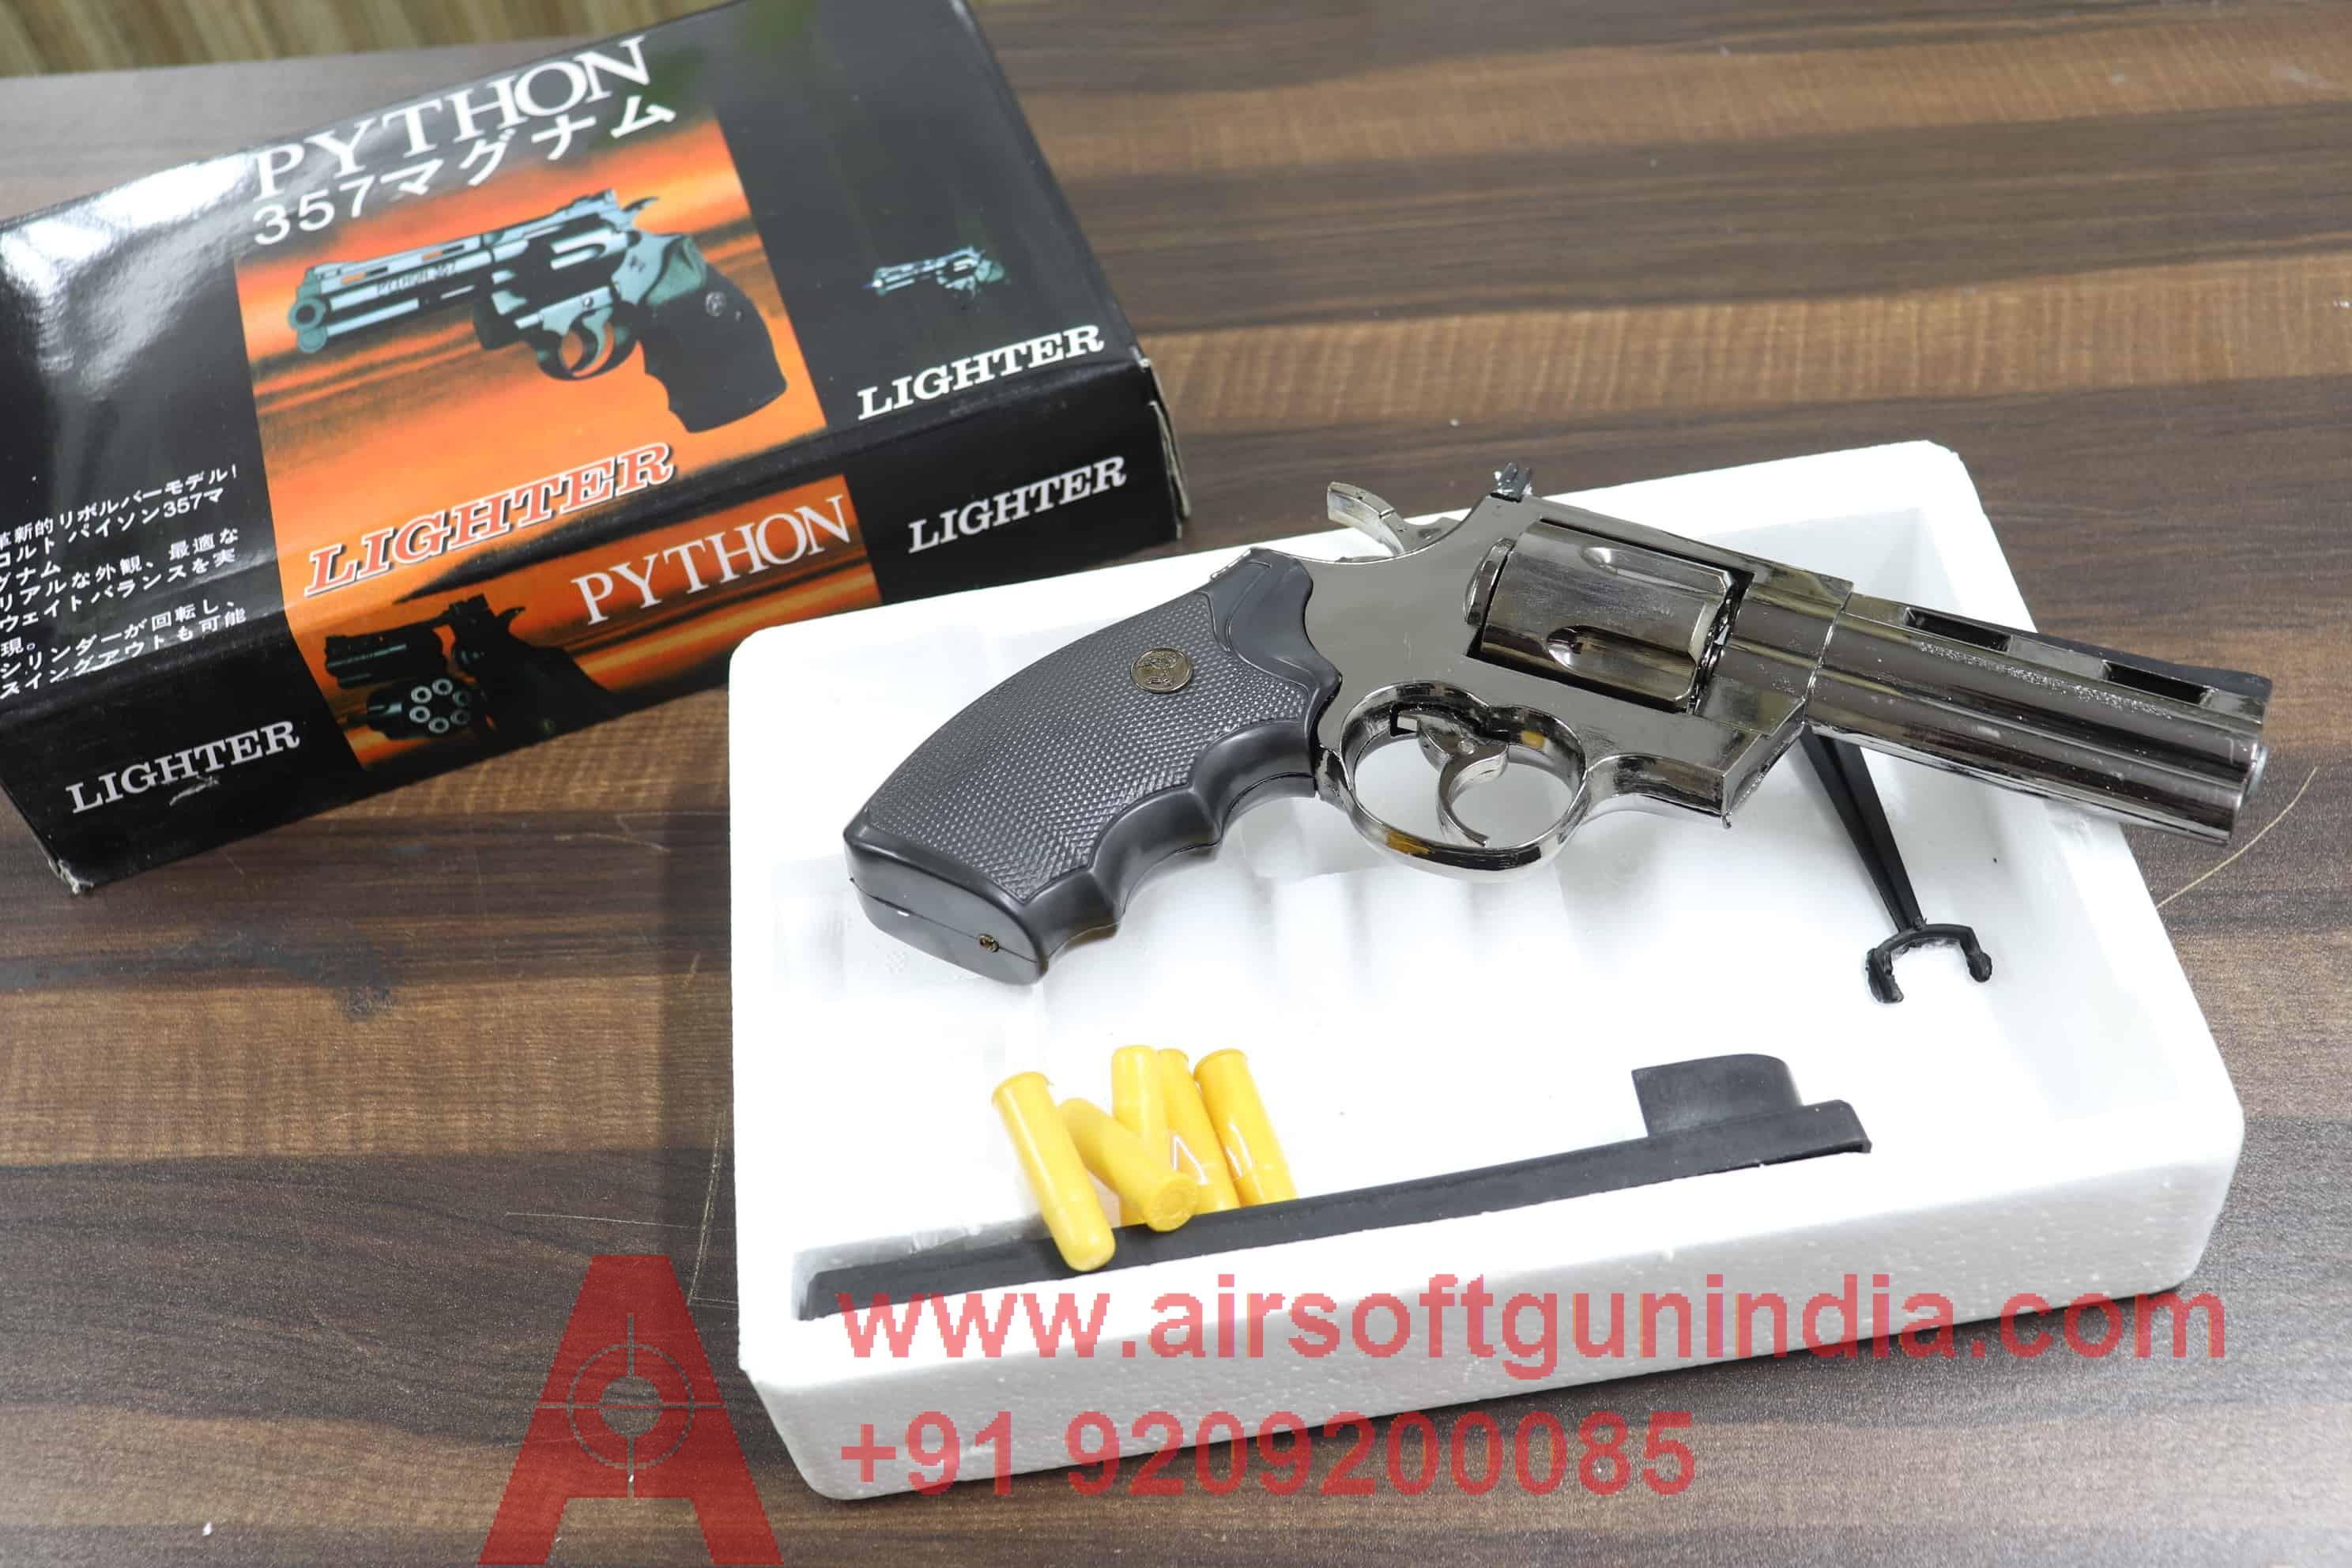 Python 357 Cigarette Lighter Replica Gun By Air Soft Gun India